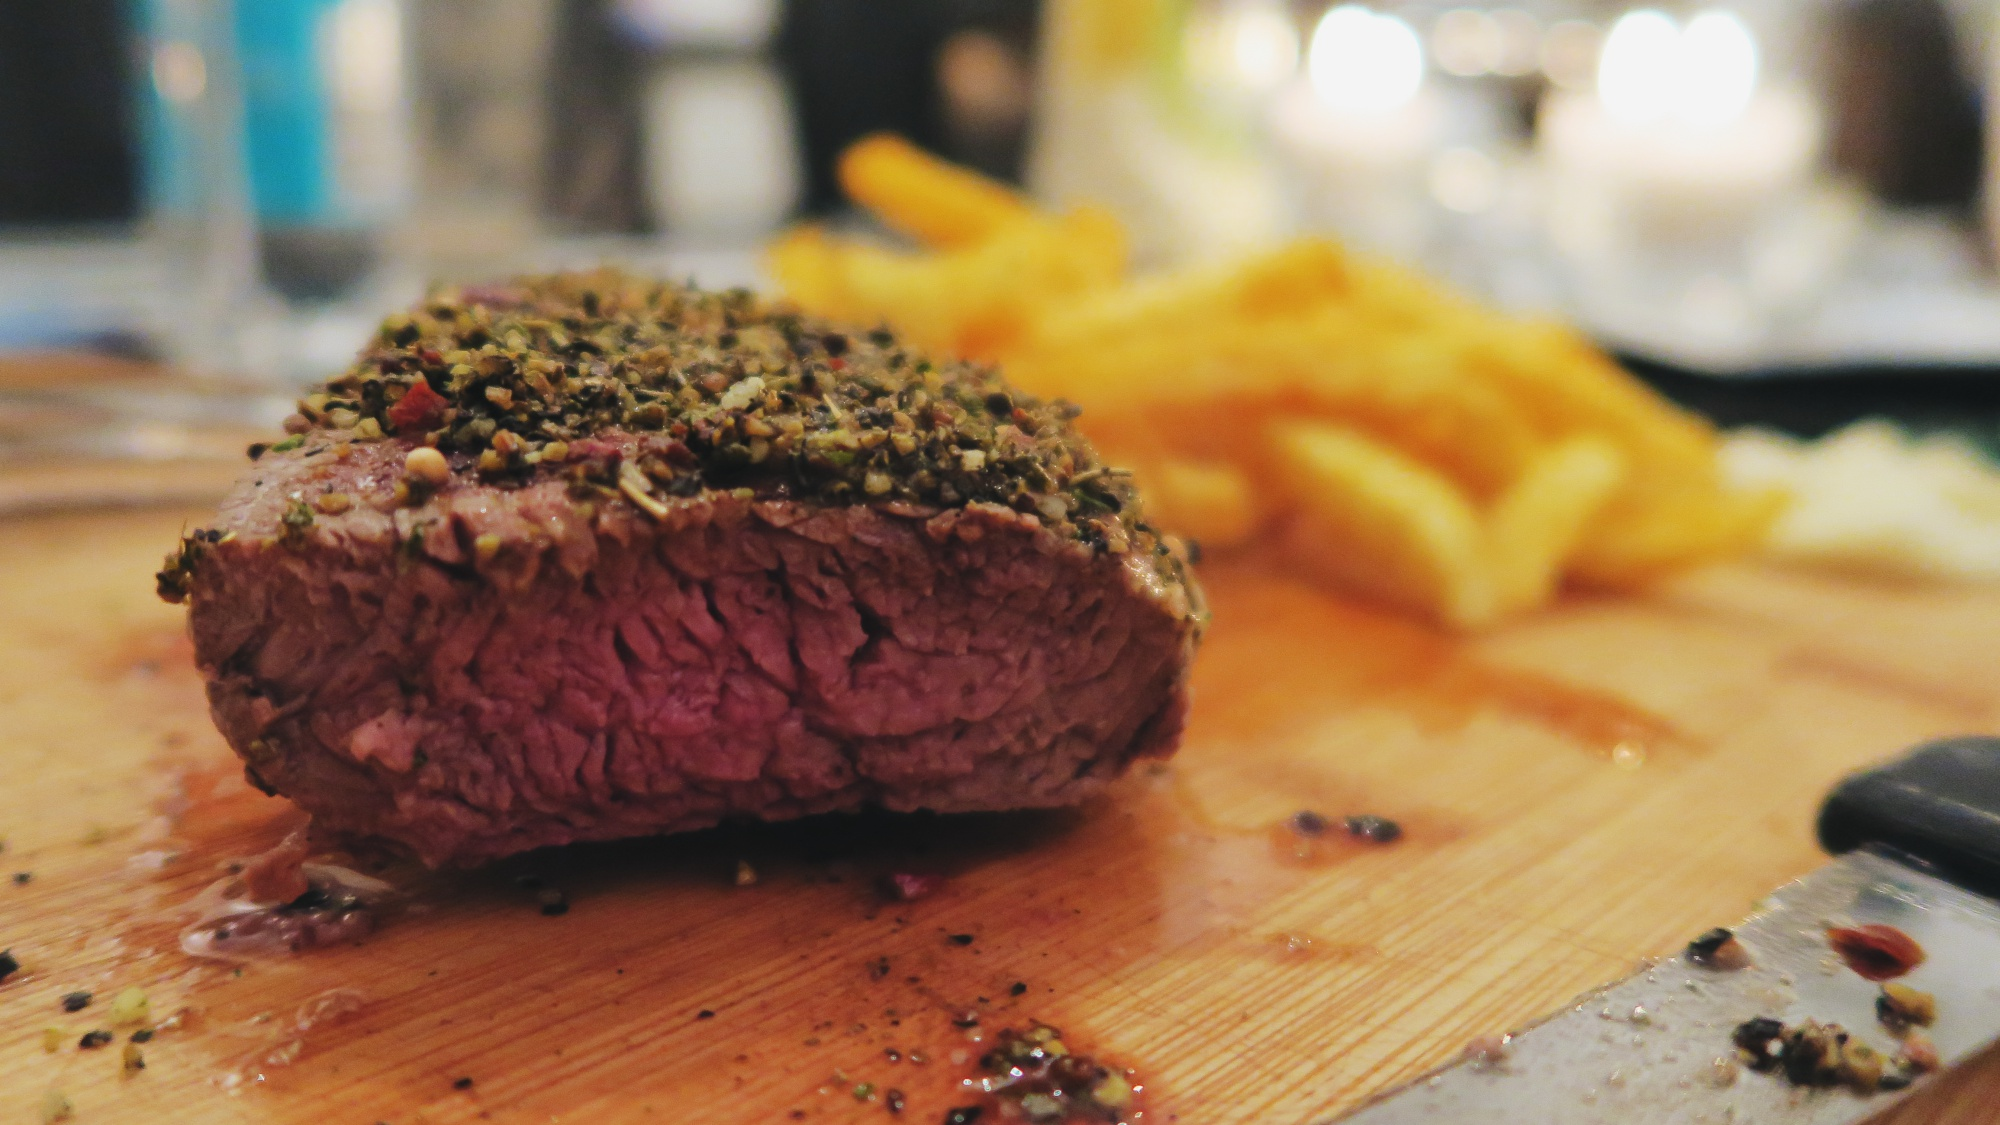 Steak (16:9)